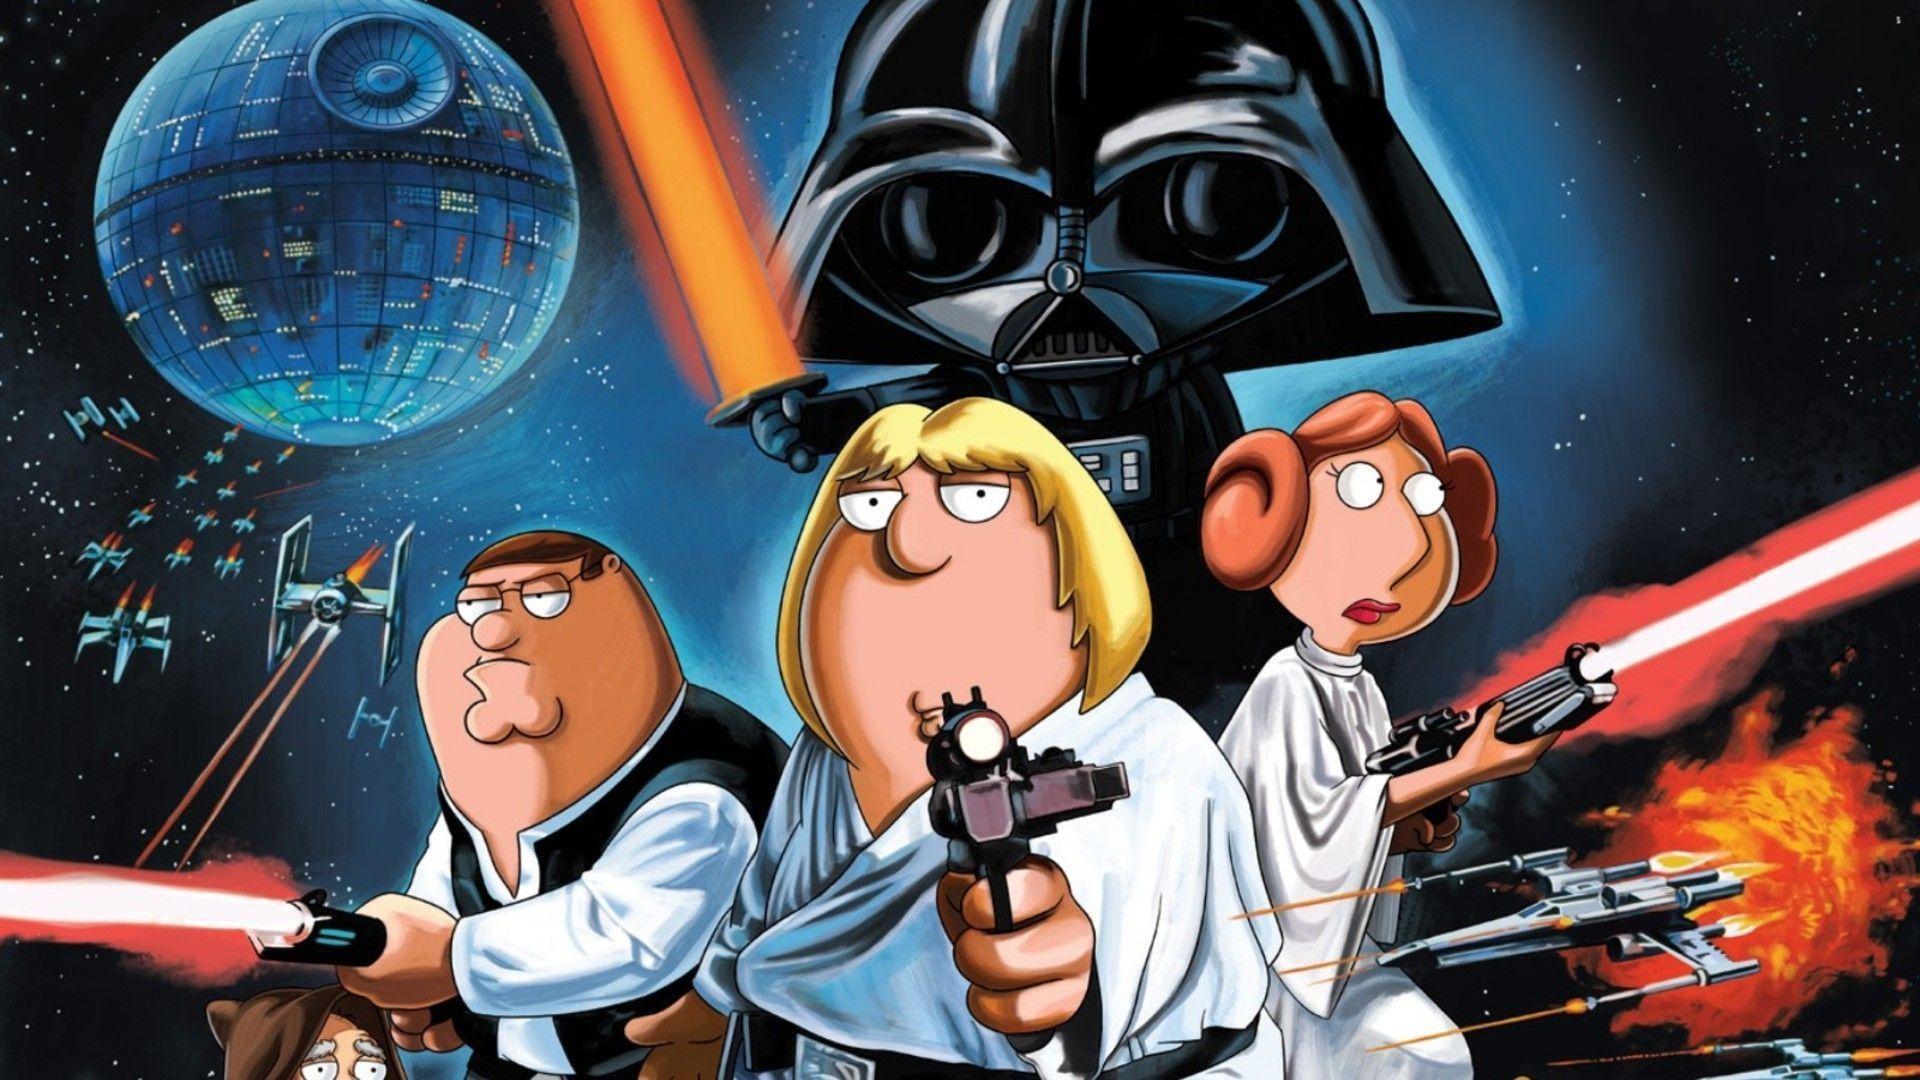 Family Guy Star Wars Wallpaper 47 Images